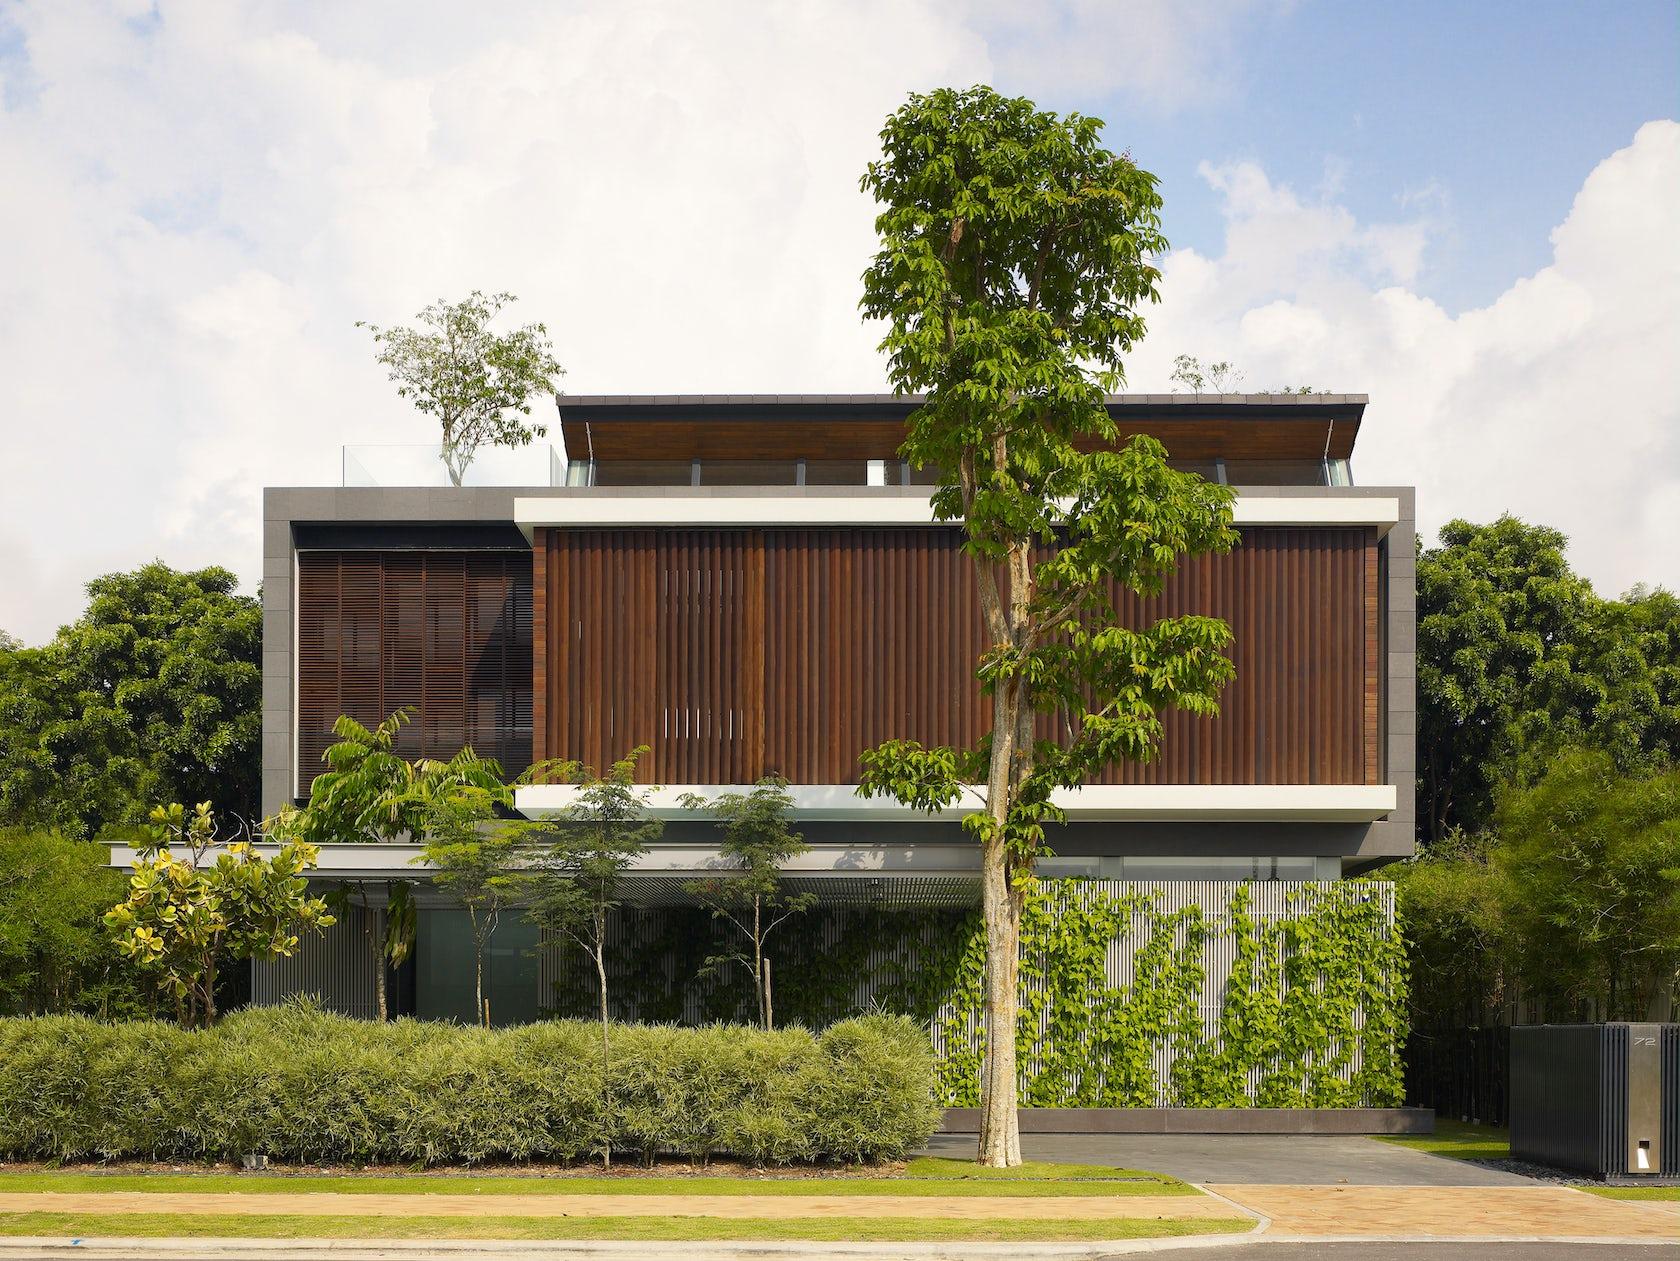 72 Sentosa Cove Architizer